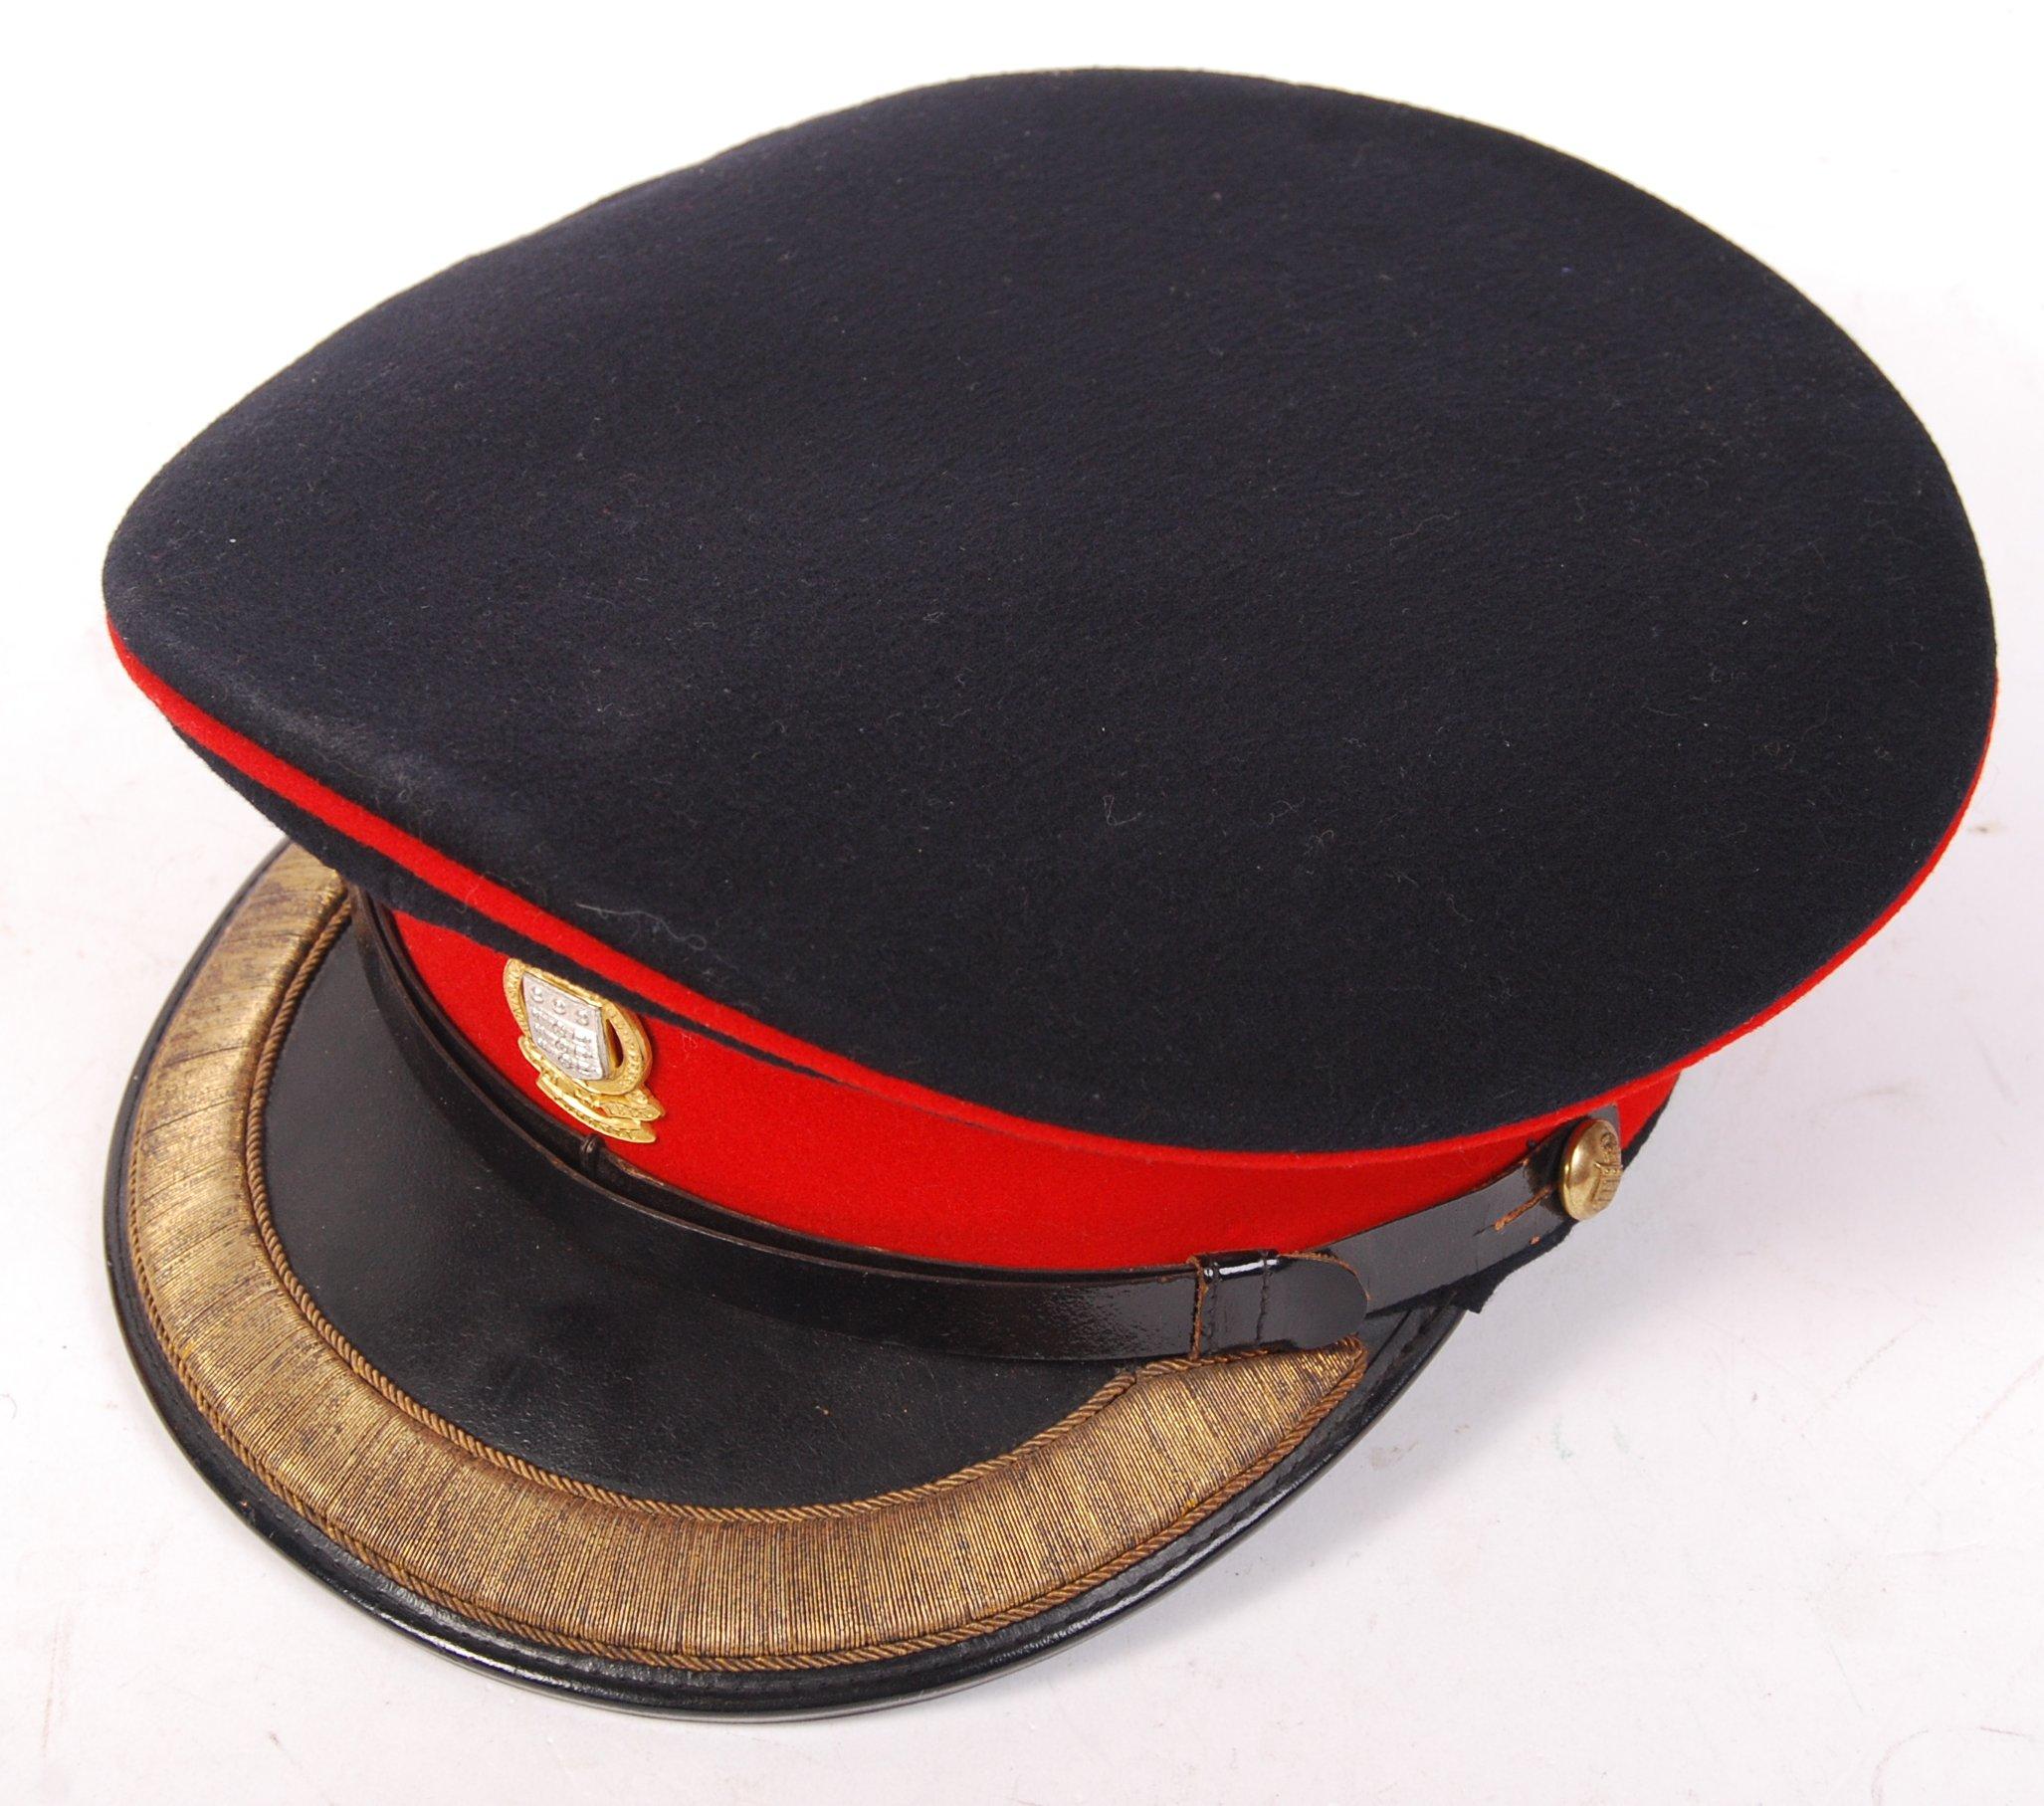 POST-WWII SECOND WORLD WAR RAOC OFFICER'S DRESS CA - Image 3 of 4